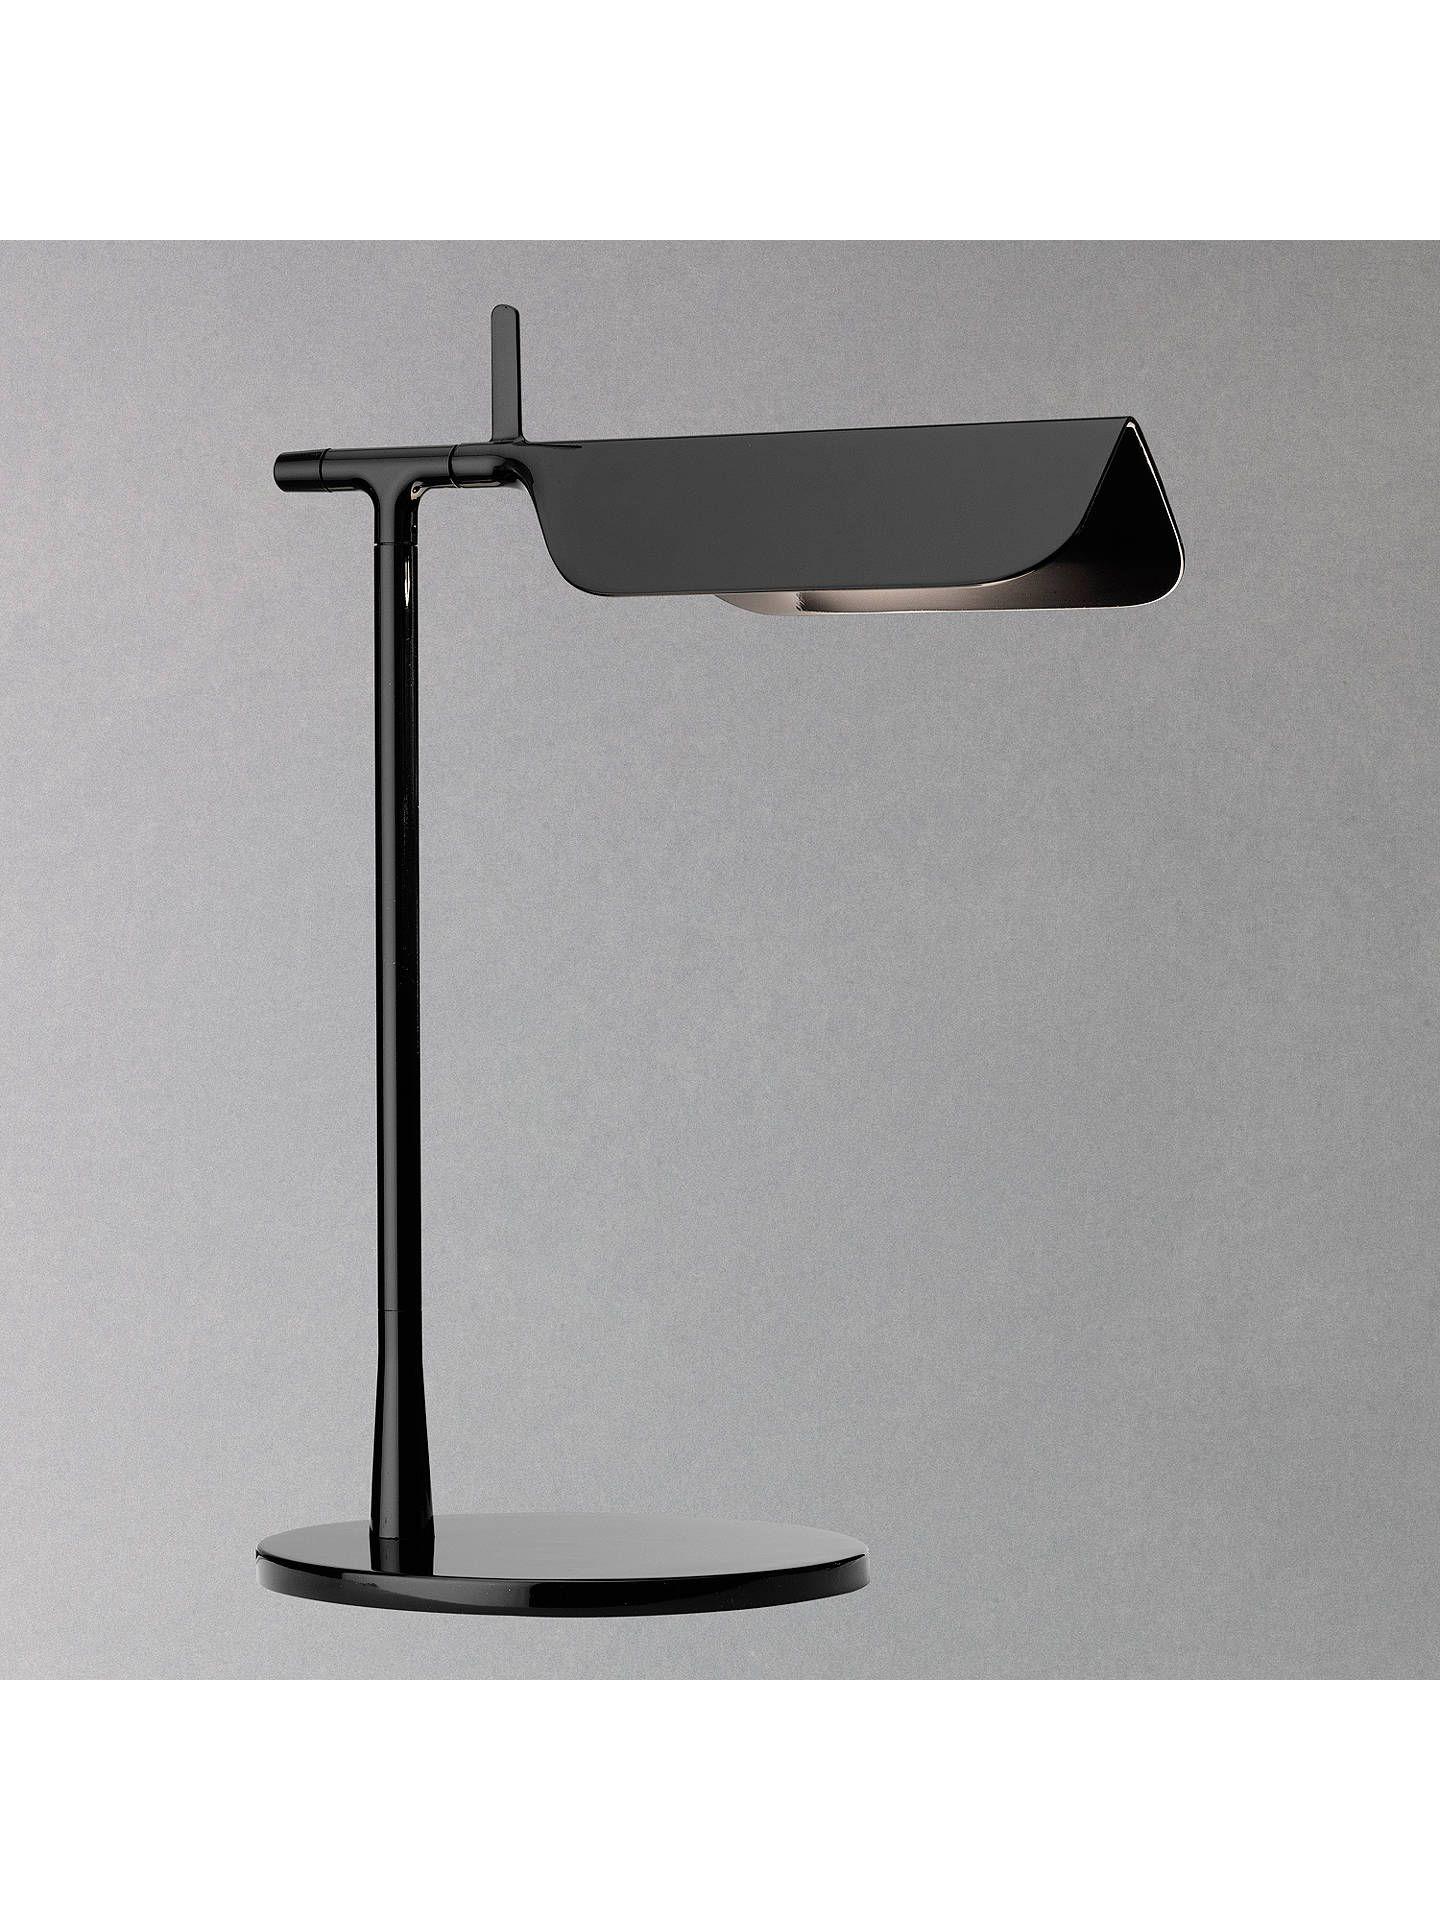 Buyflos tab led desk lamp black online at johnlewis lamparas